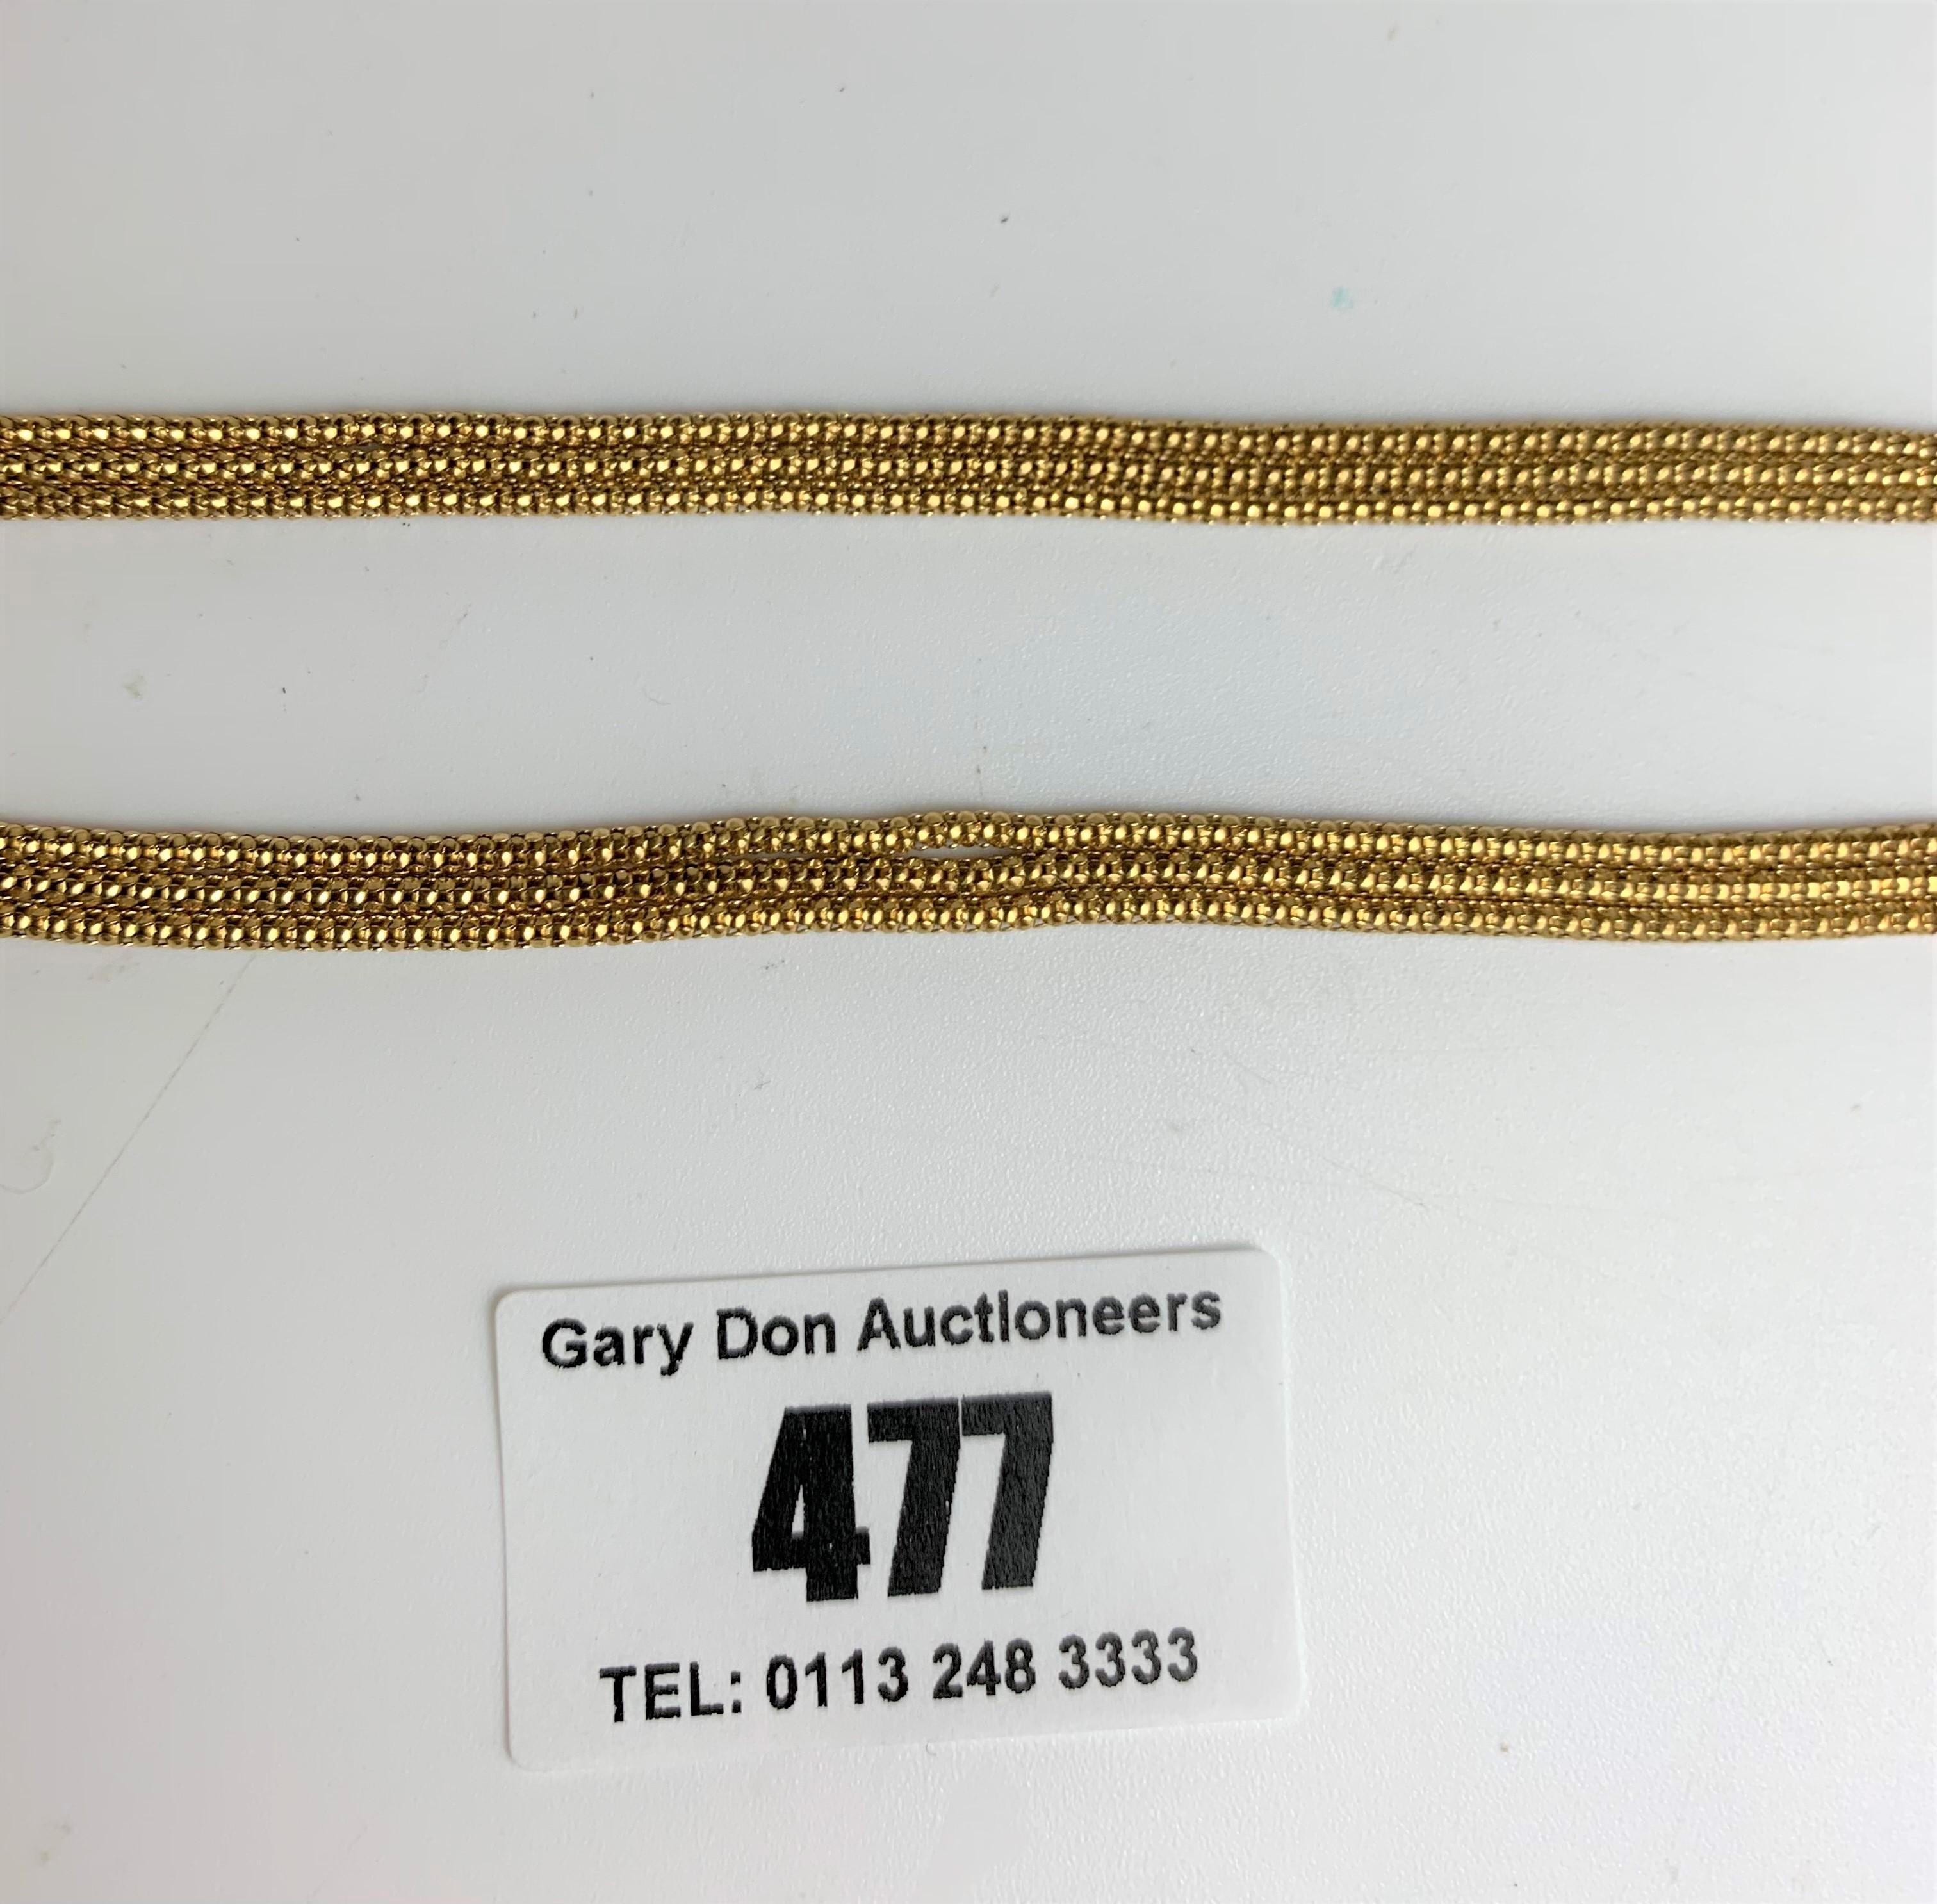 "9k gold necklace, length 16.5"", w: 11.4 gms - Image 4 of 5"